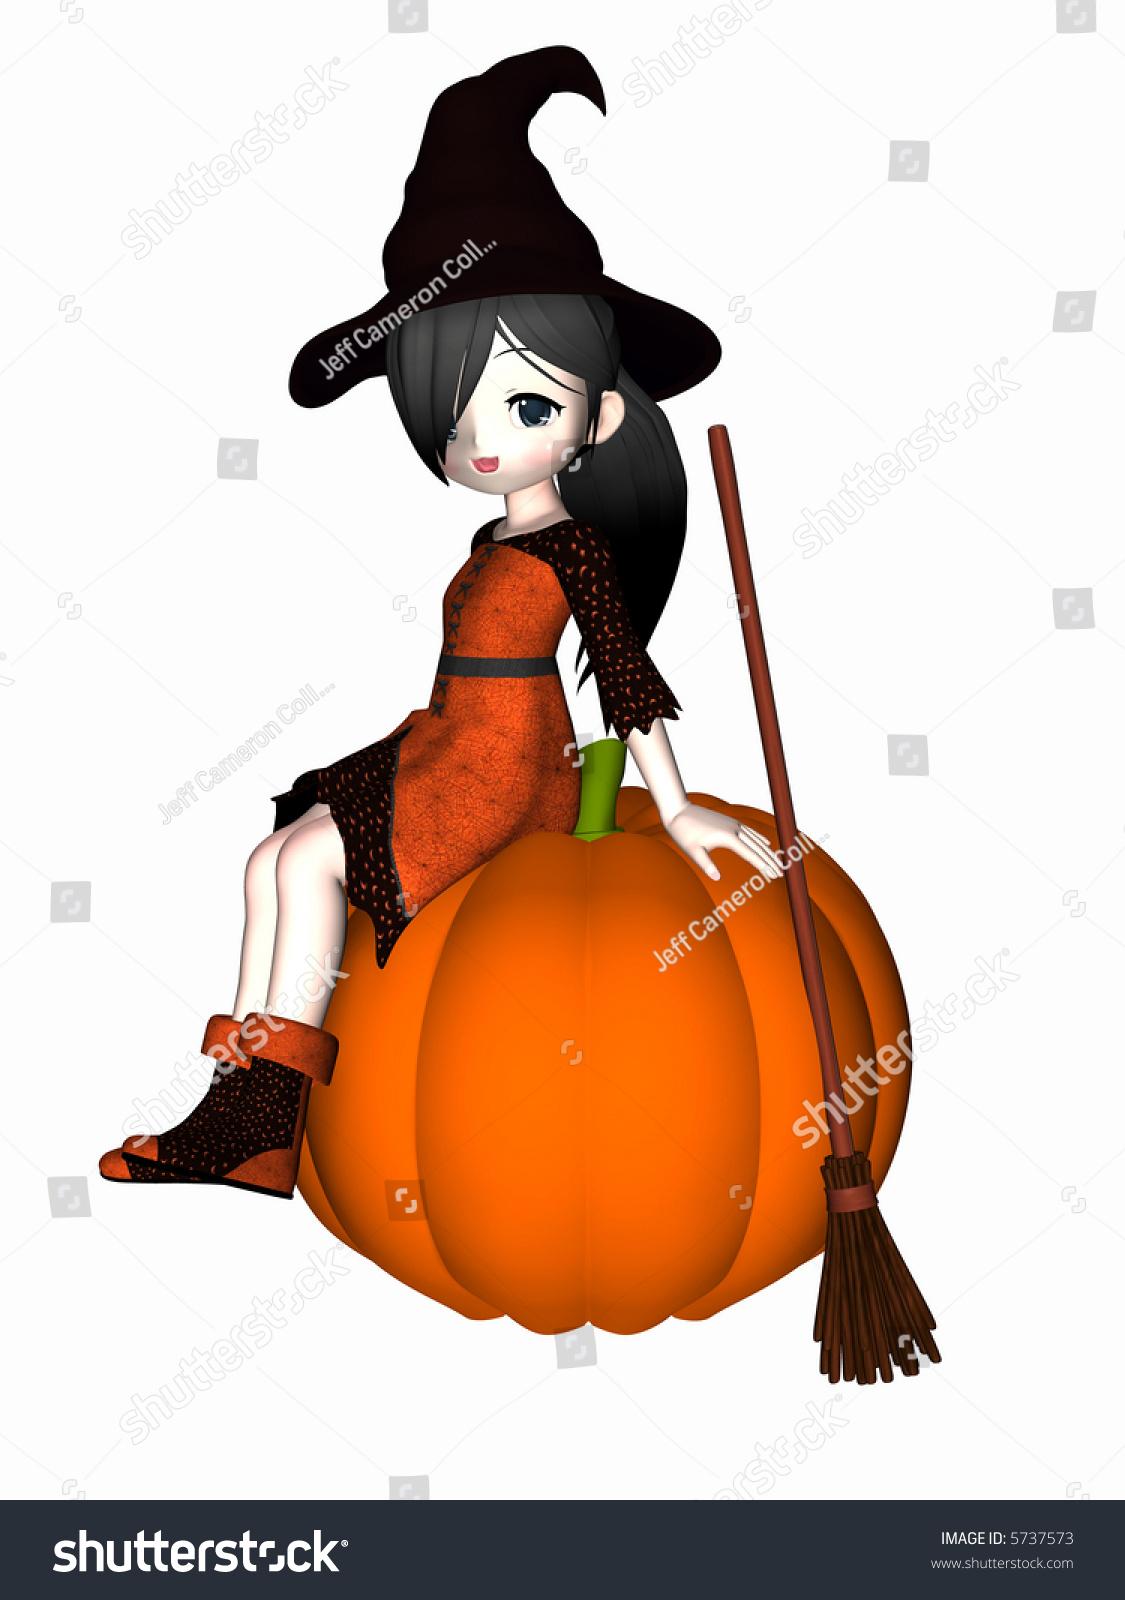 Anime Witch Black Hair Sitting On Stock Illustration 5737573 ...